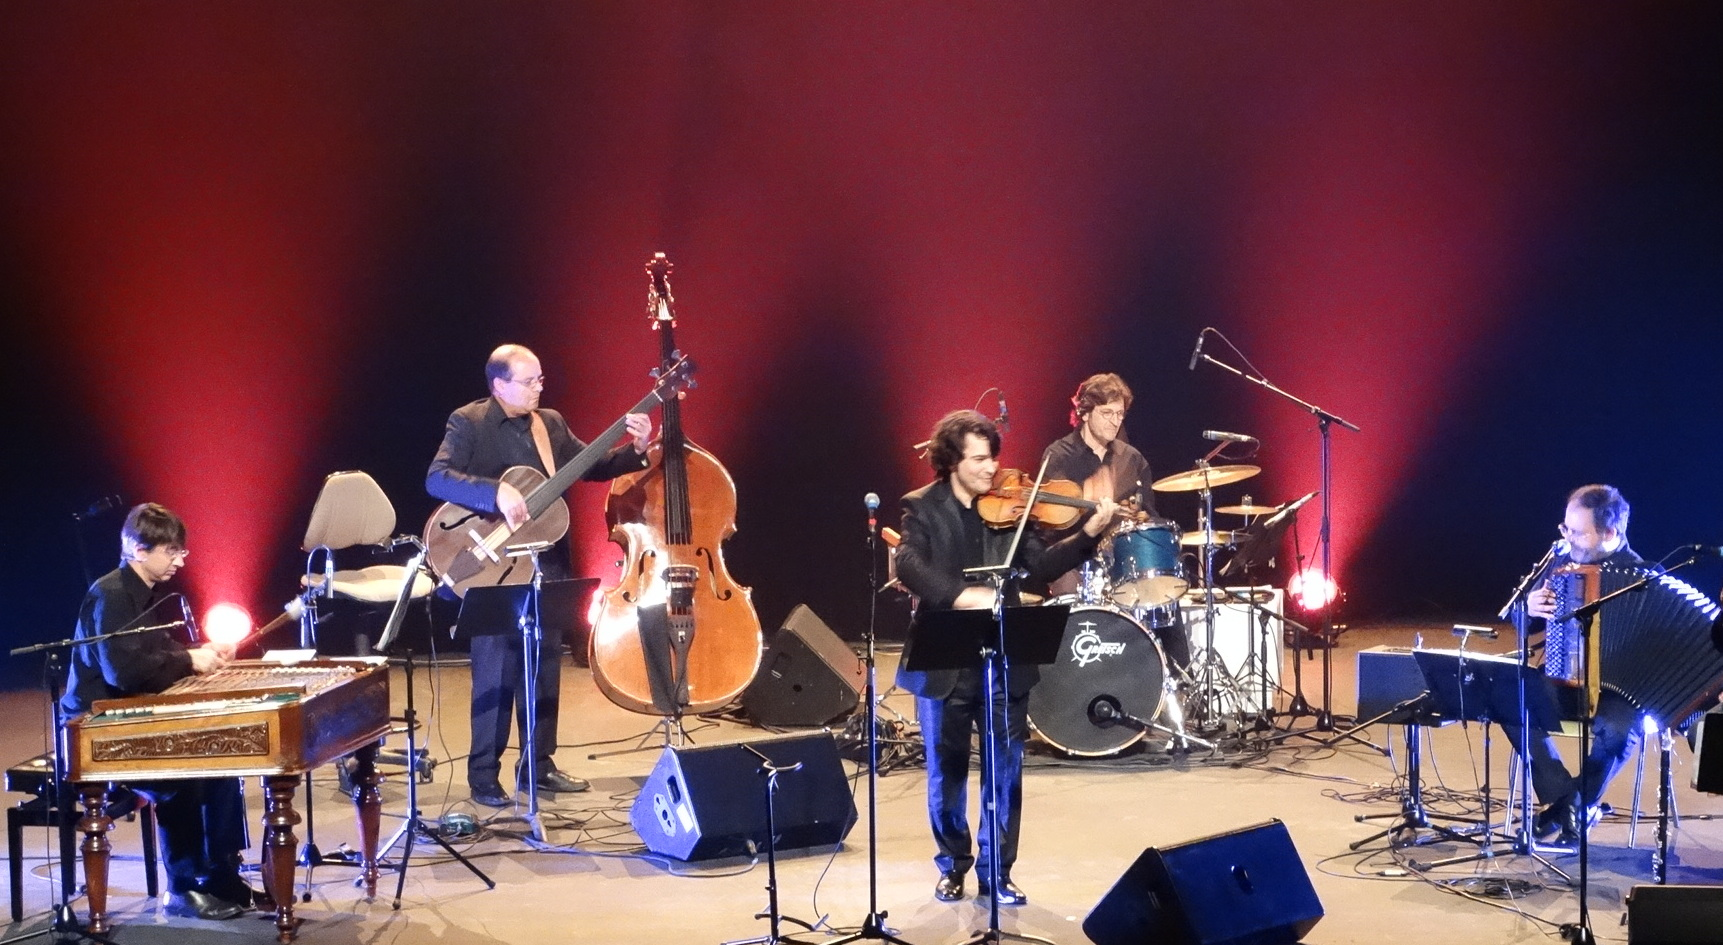 Manguina Paris Klezmer Band